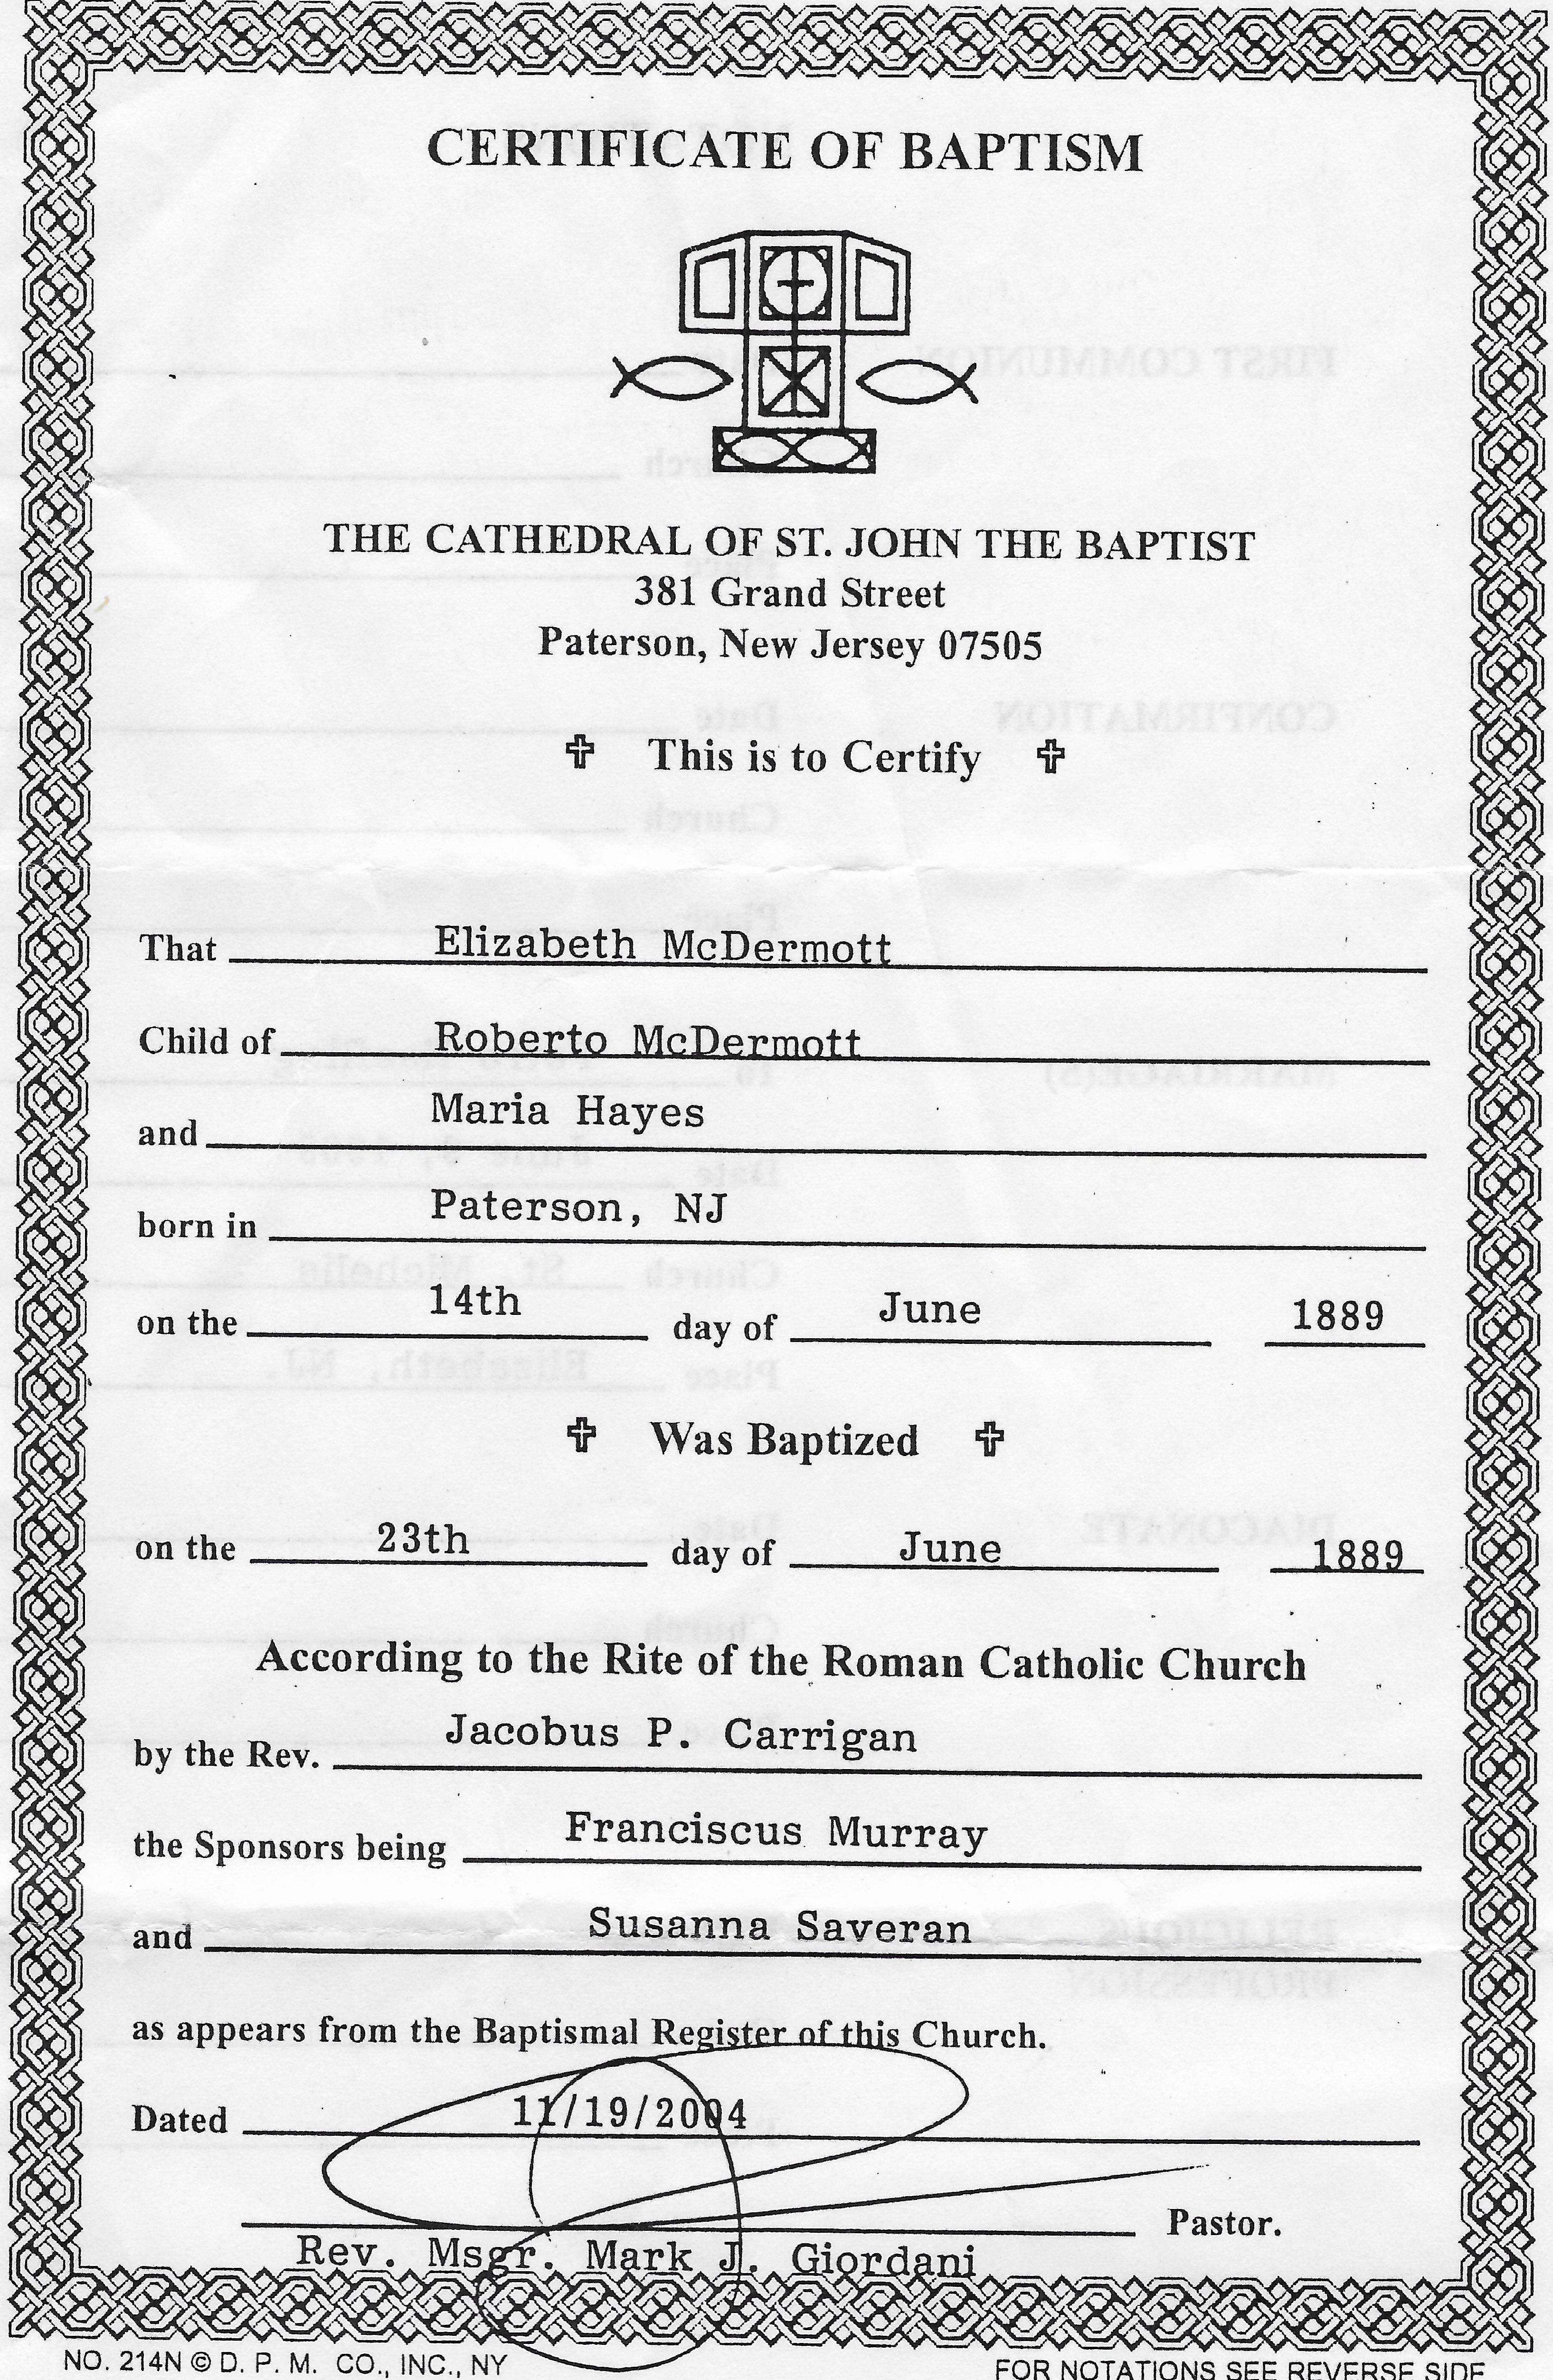 Baptismal Certificate Of Elizabeth Mcdermott Nannies Mother At